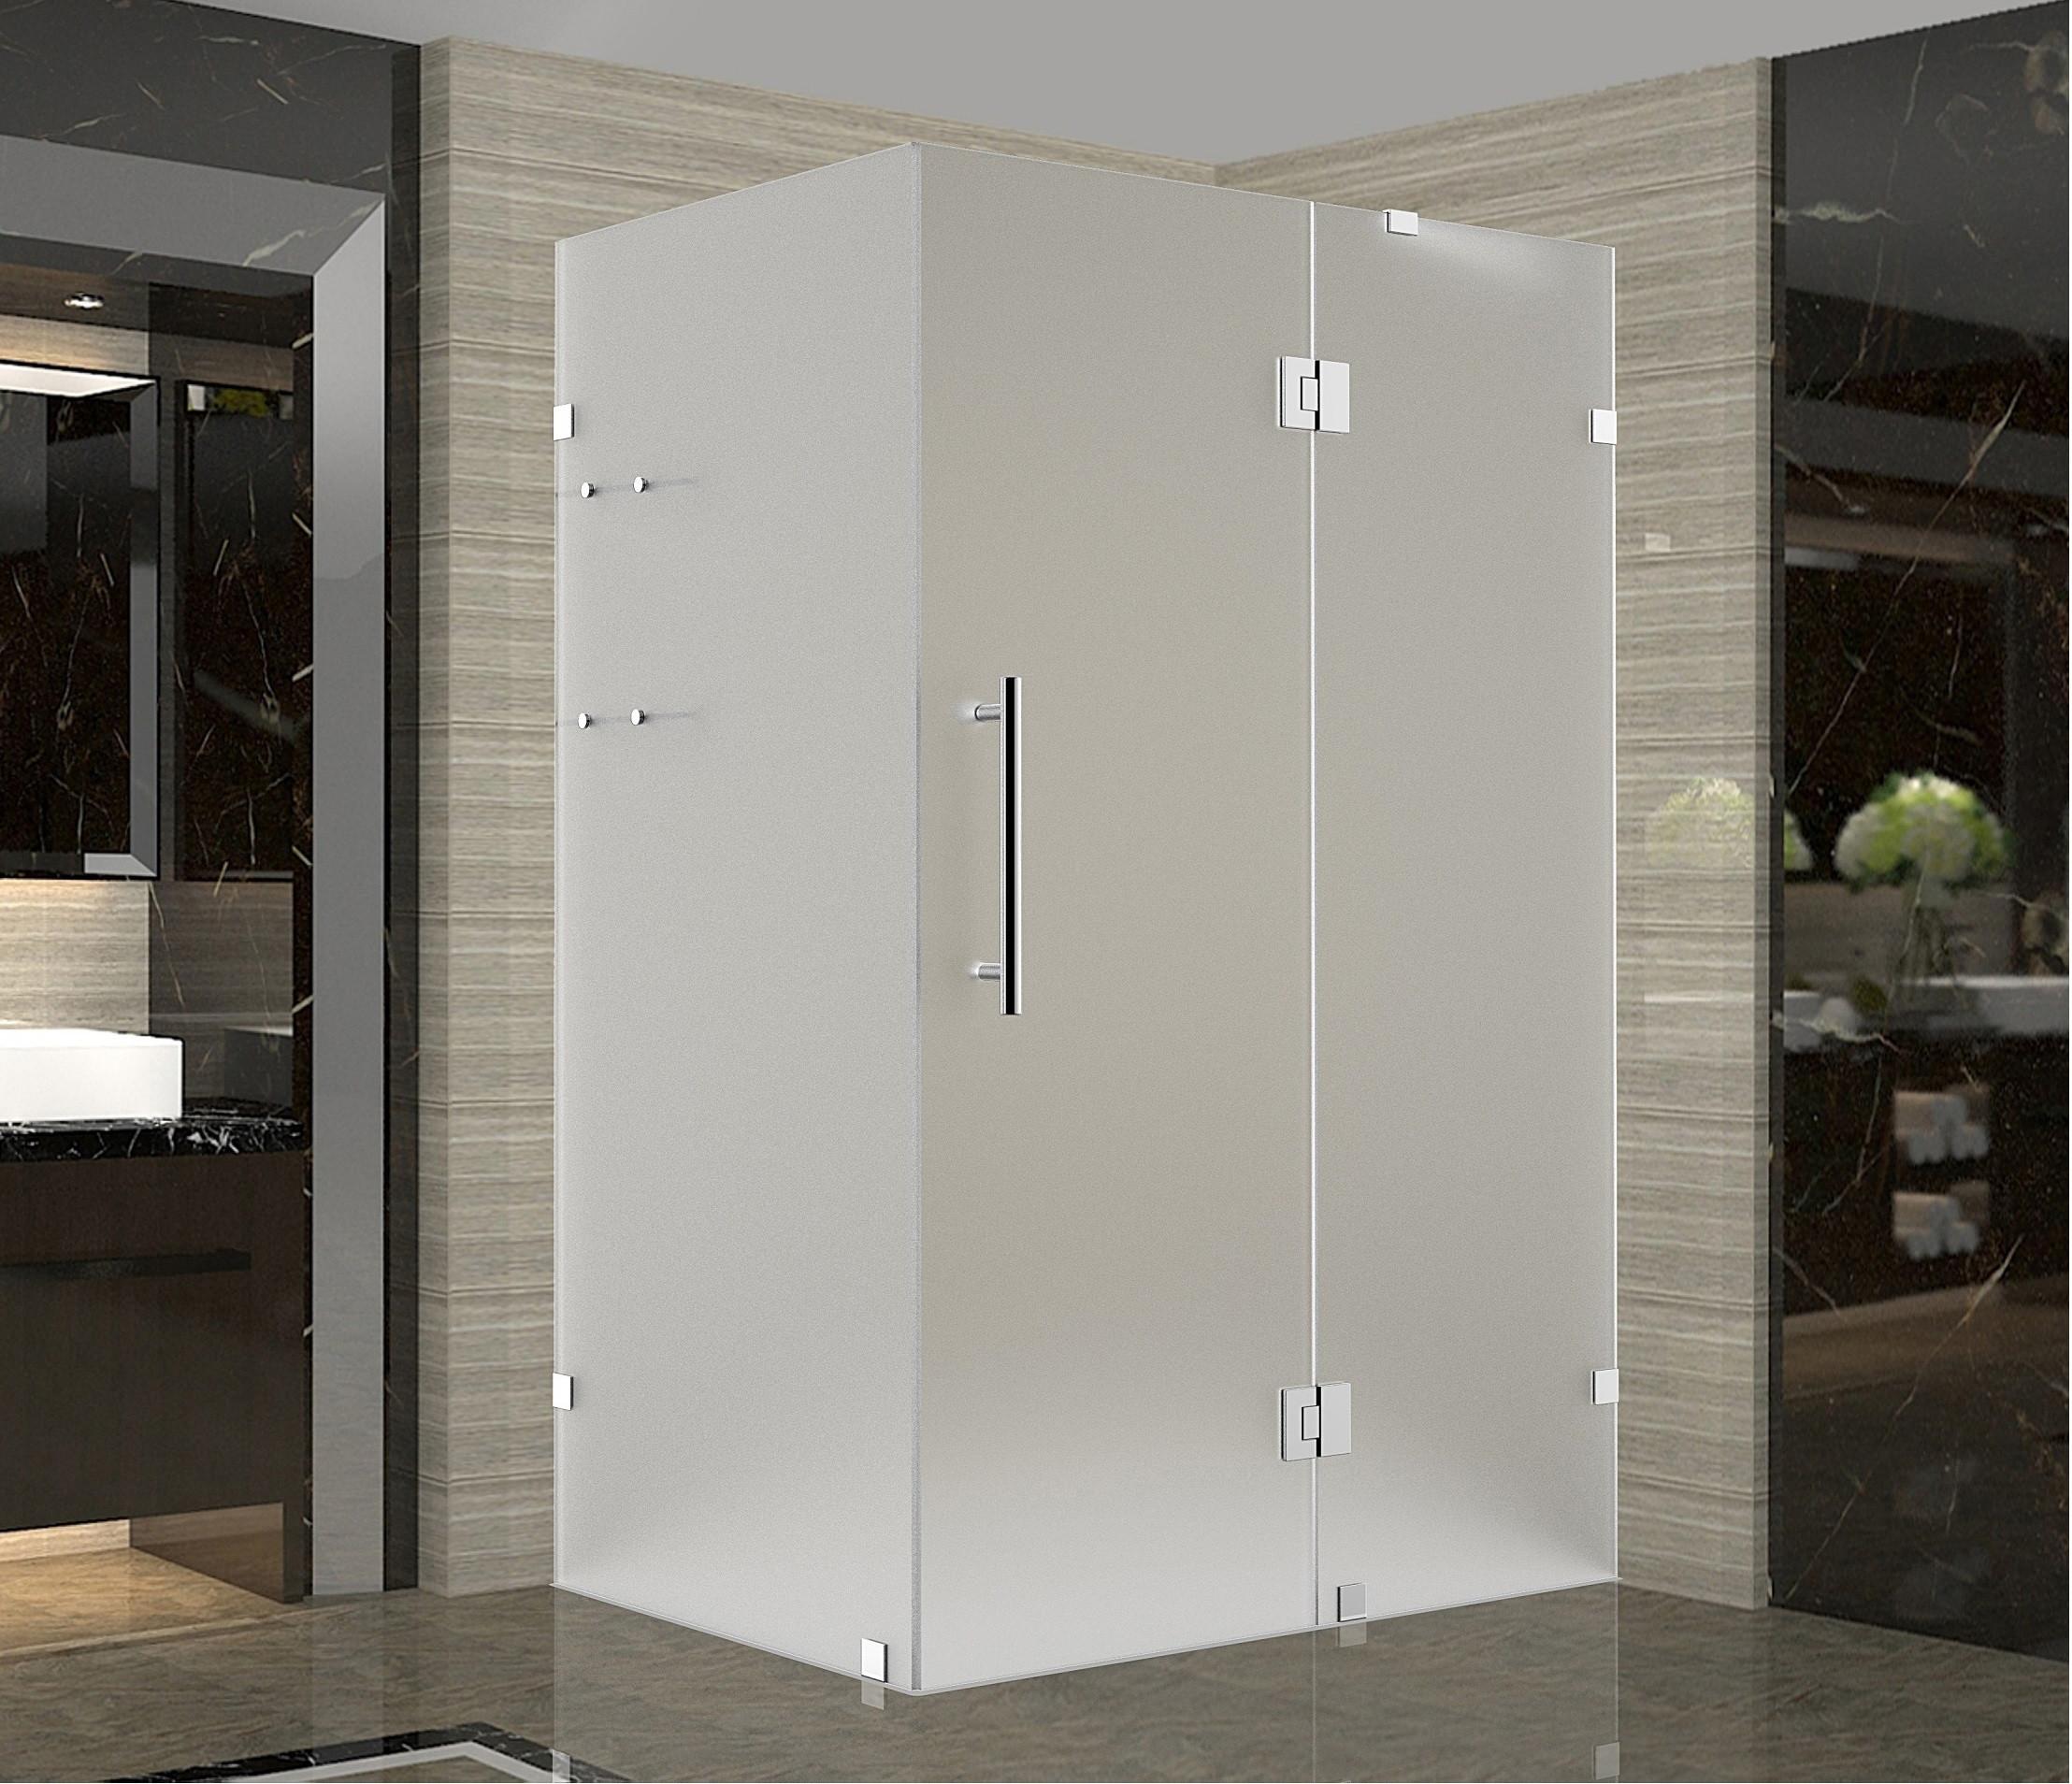 Aston Global SEN992F-SS-3734-10 Stainless Steel Completely Frameless Frosted Glass Shower Enclosure